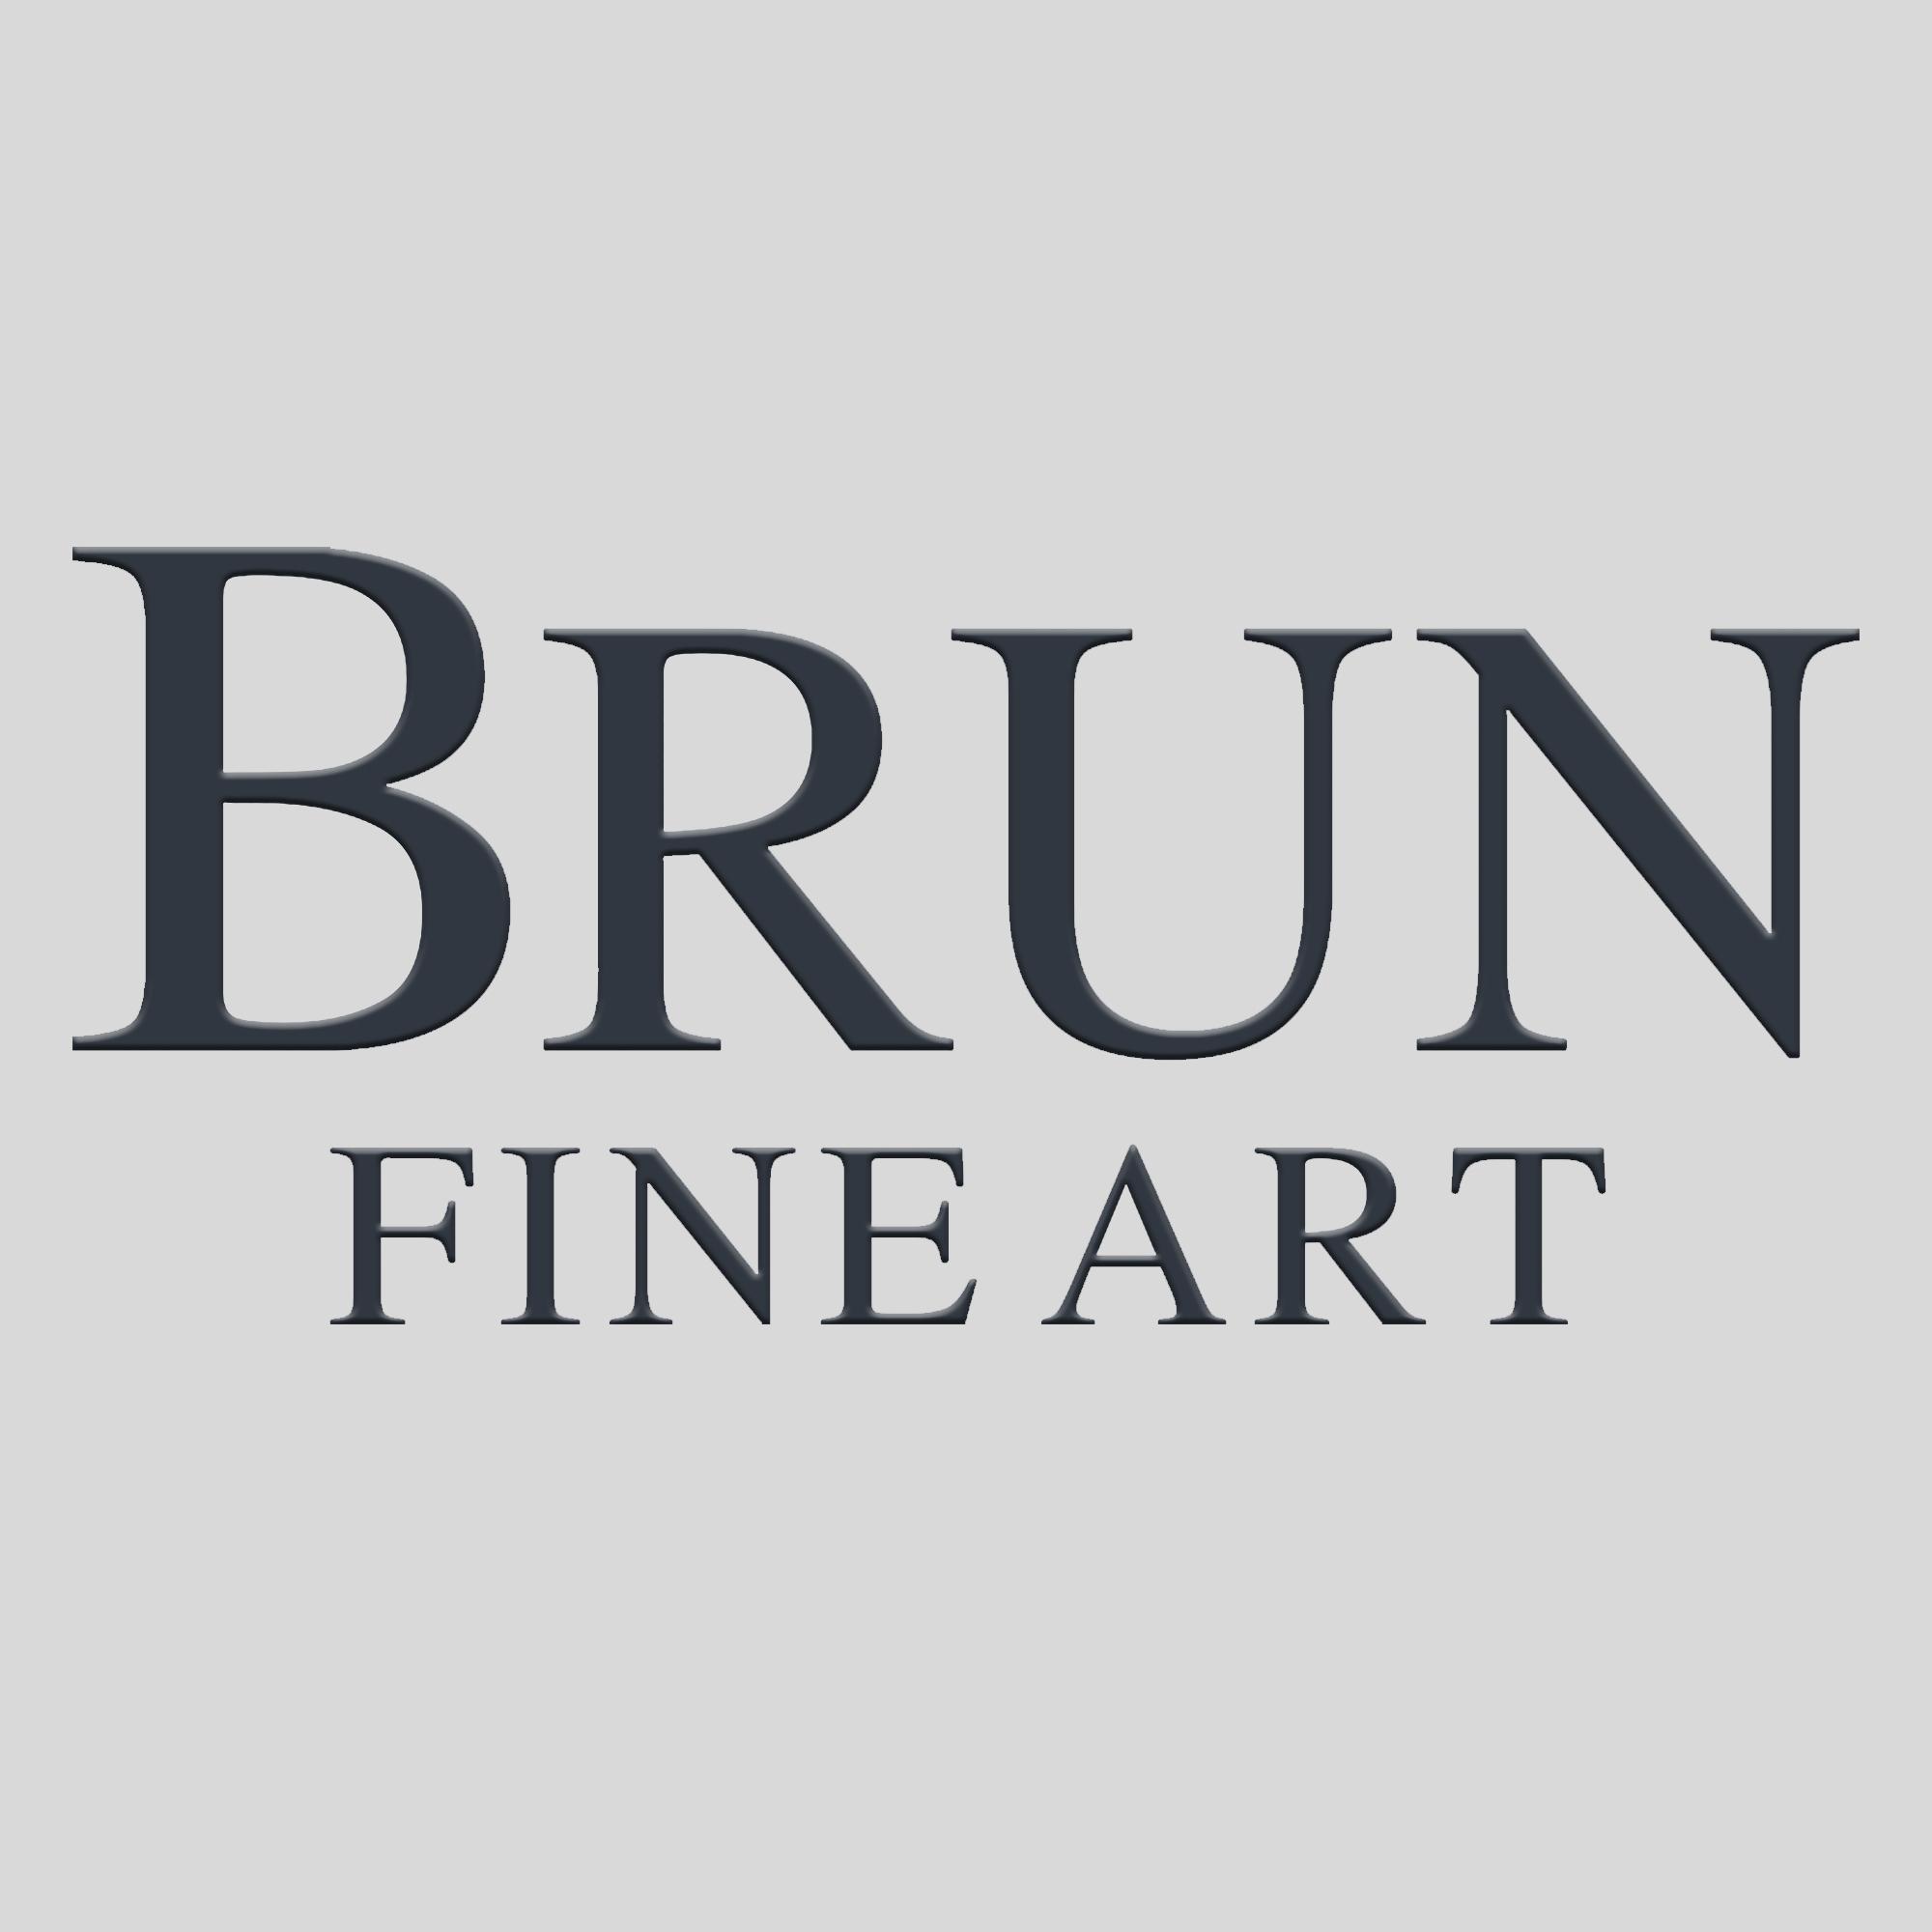 Brun Fine Art